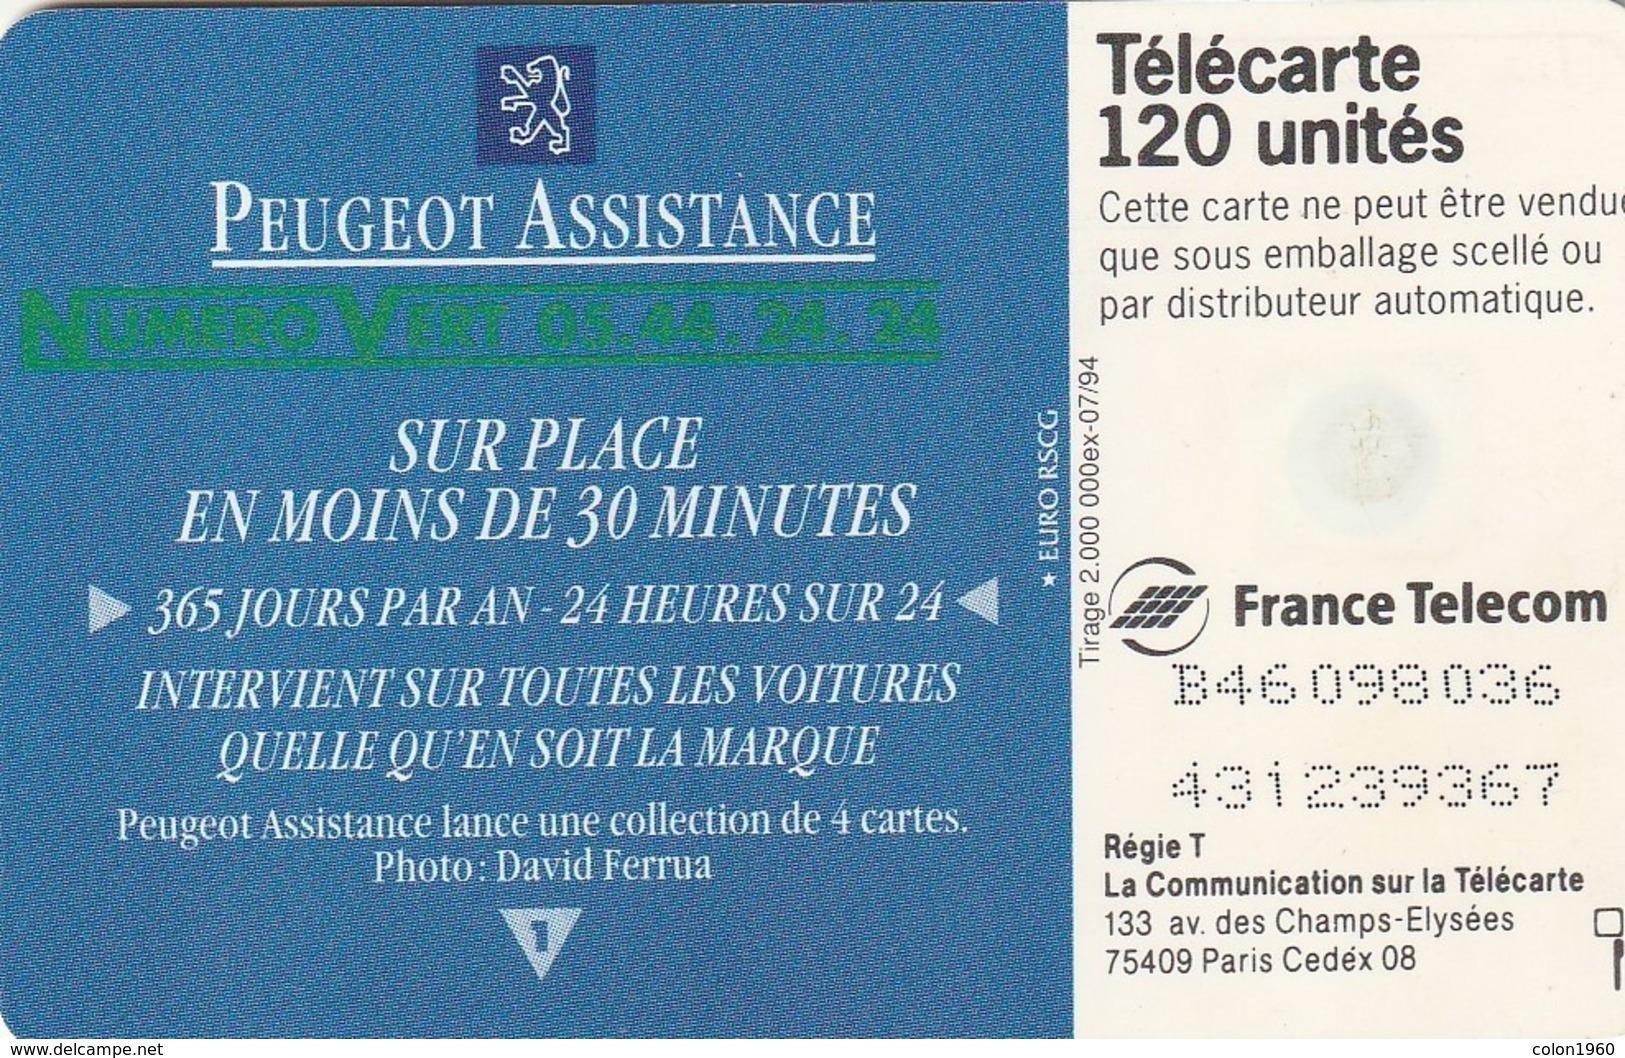 FRANCIA. Peugeot Assistance 1, 120U. 0486. 07/94. (008) - Erótica (Adultos)